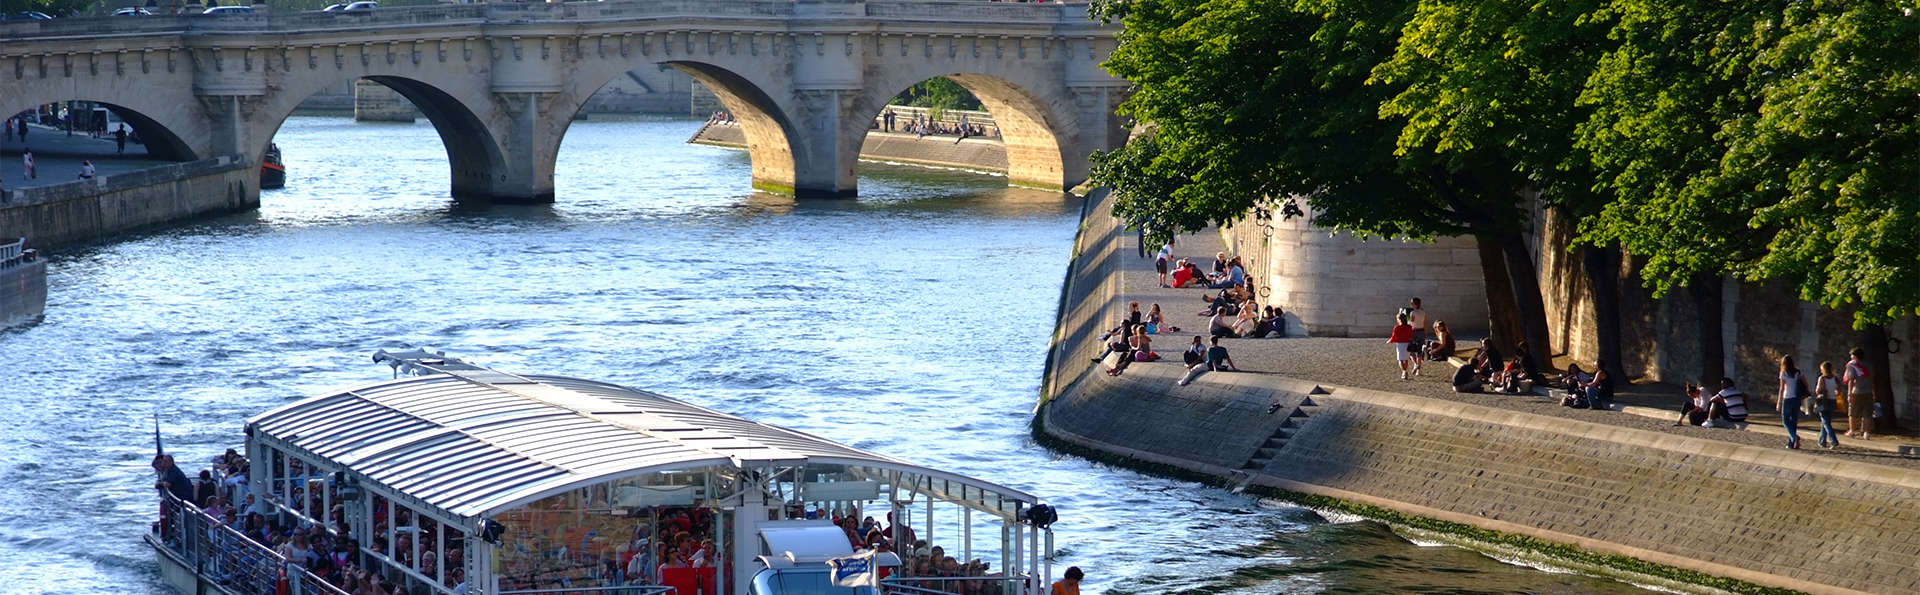 Hôtel Elysées Flaubert  - EDIT_Destination_Paris3.jpg